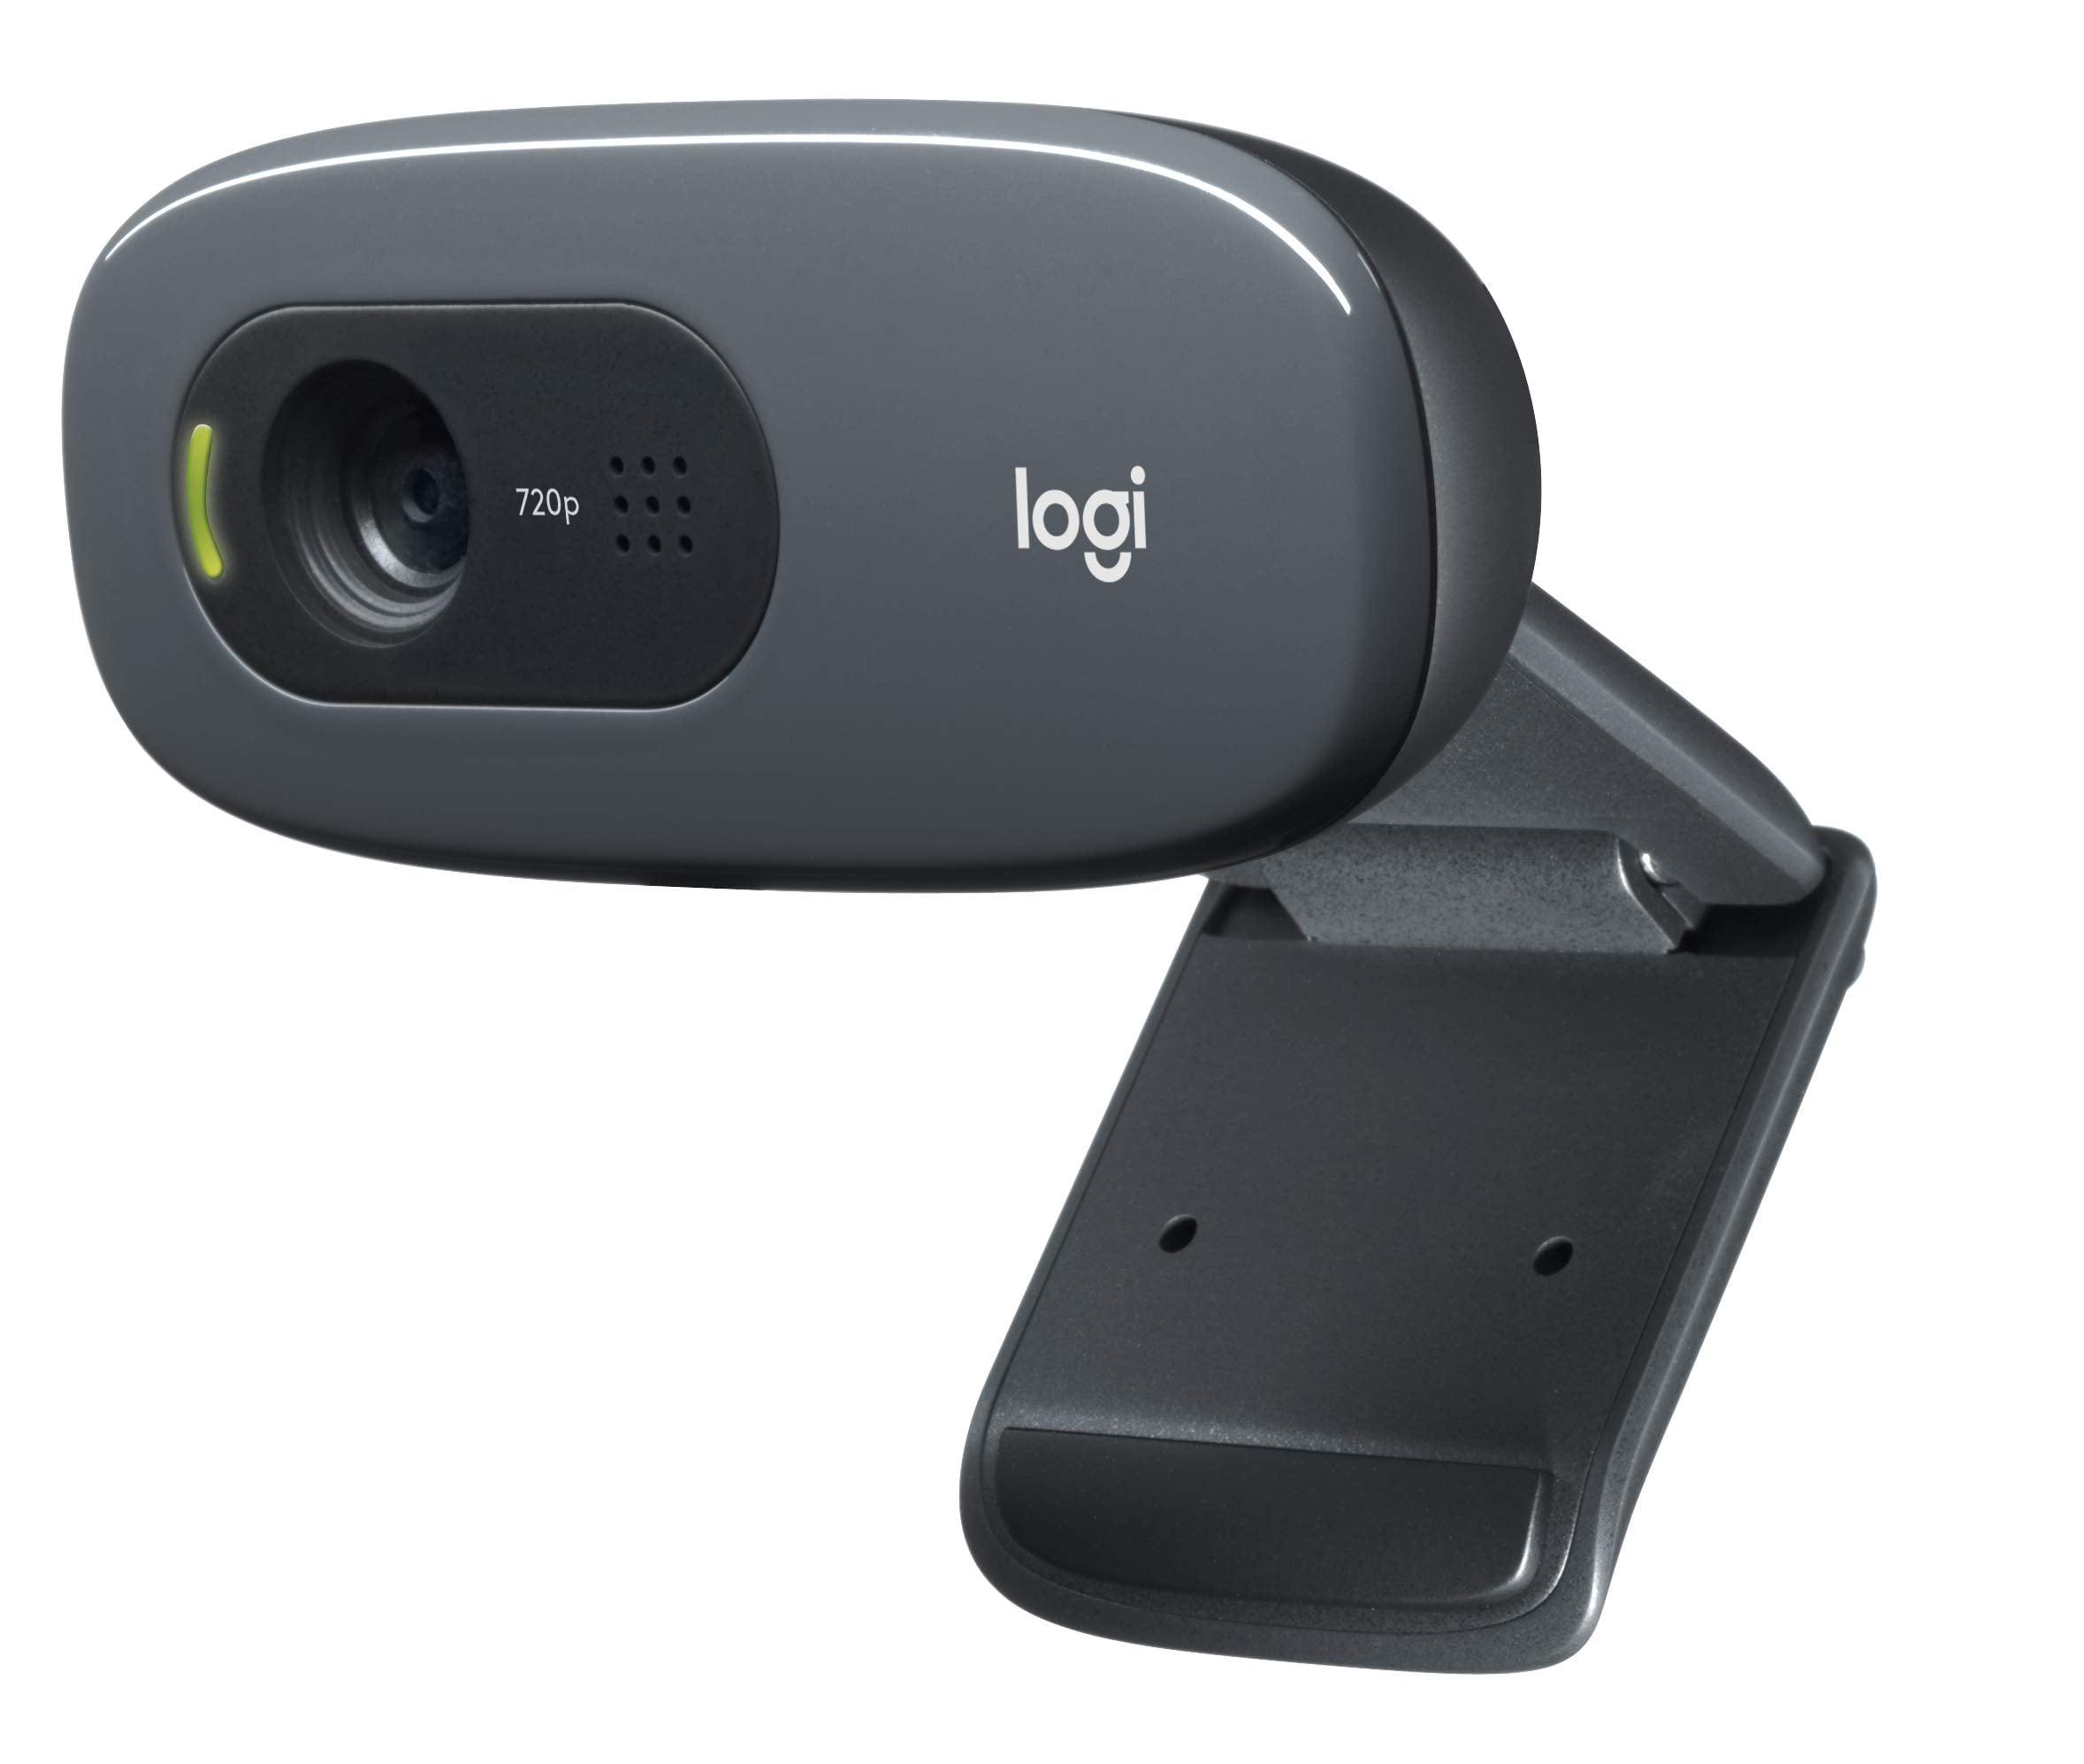 Logitech C270 Desktop or Laptop Webcam,  HD 720p Widescreen for Video Calling and Recording - Walmart.com